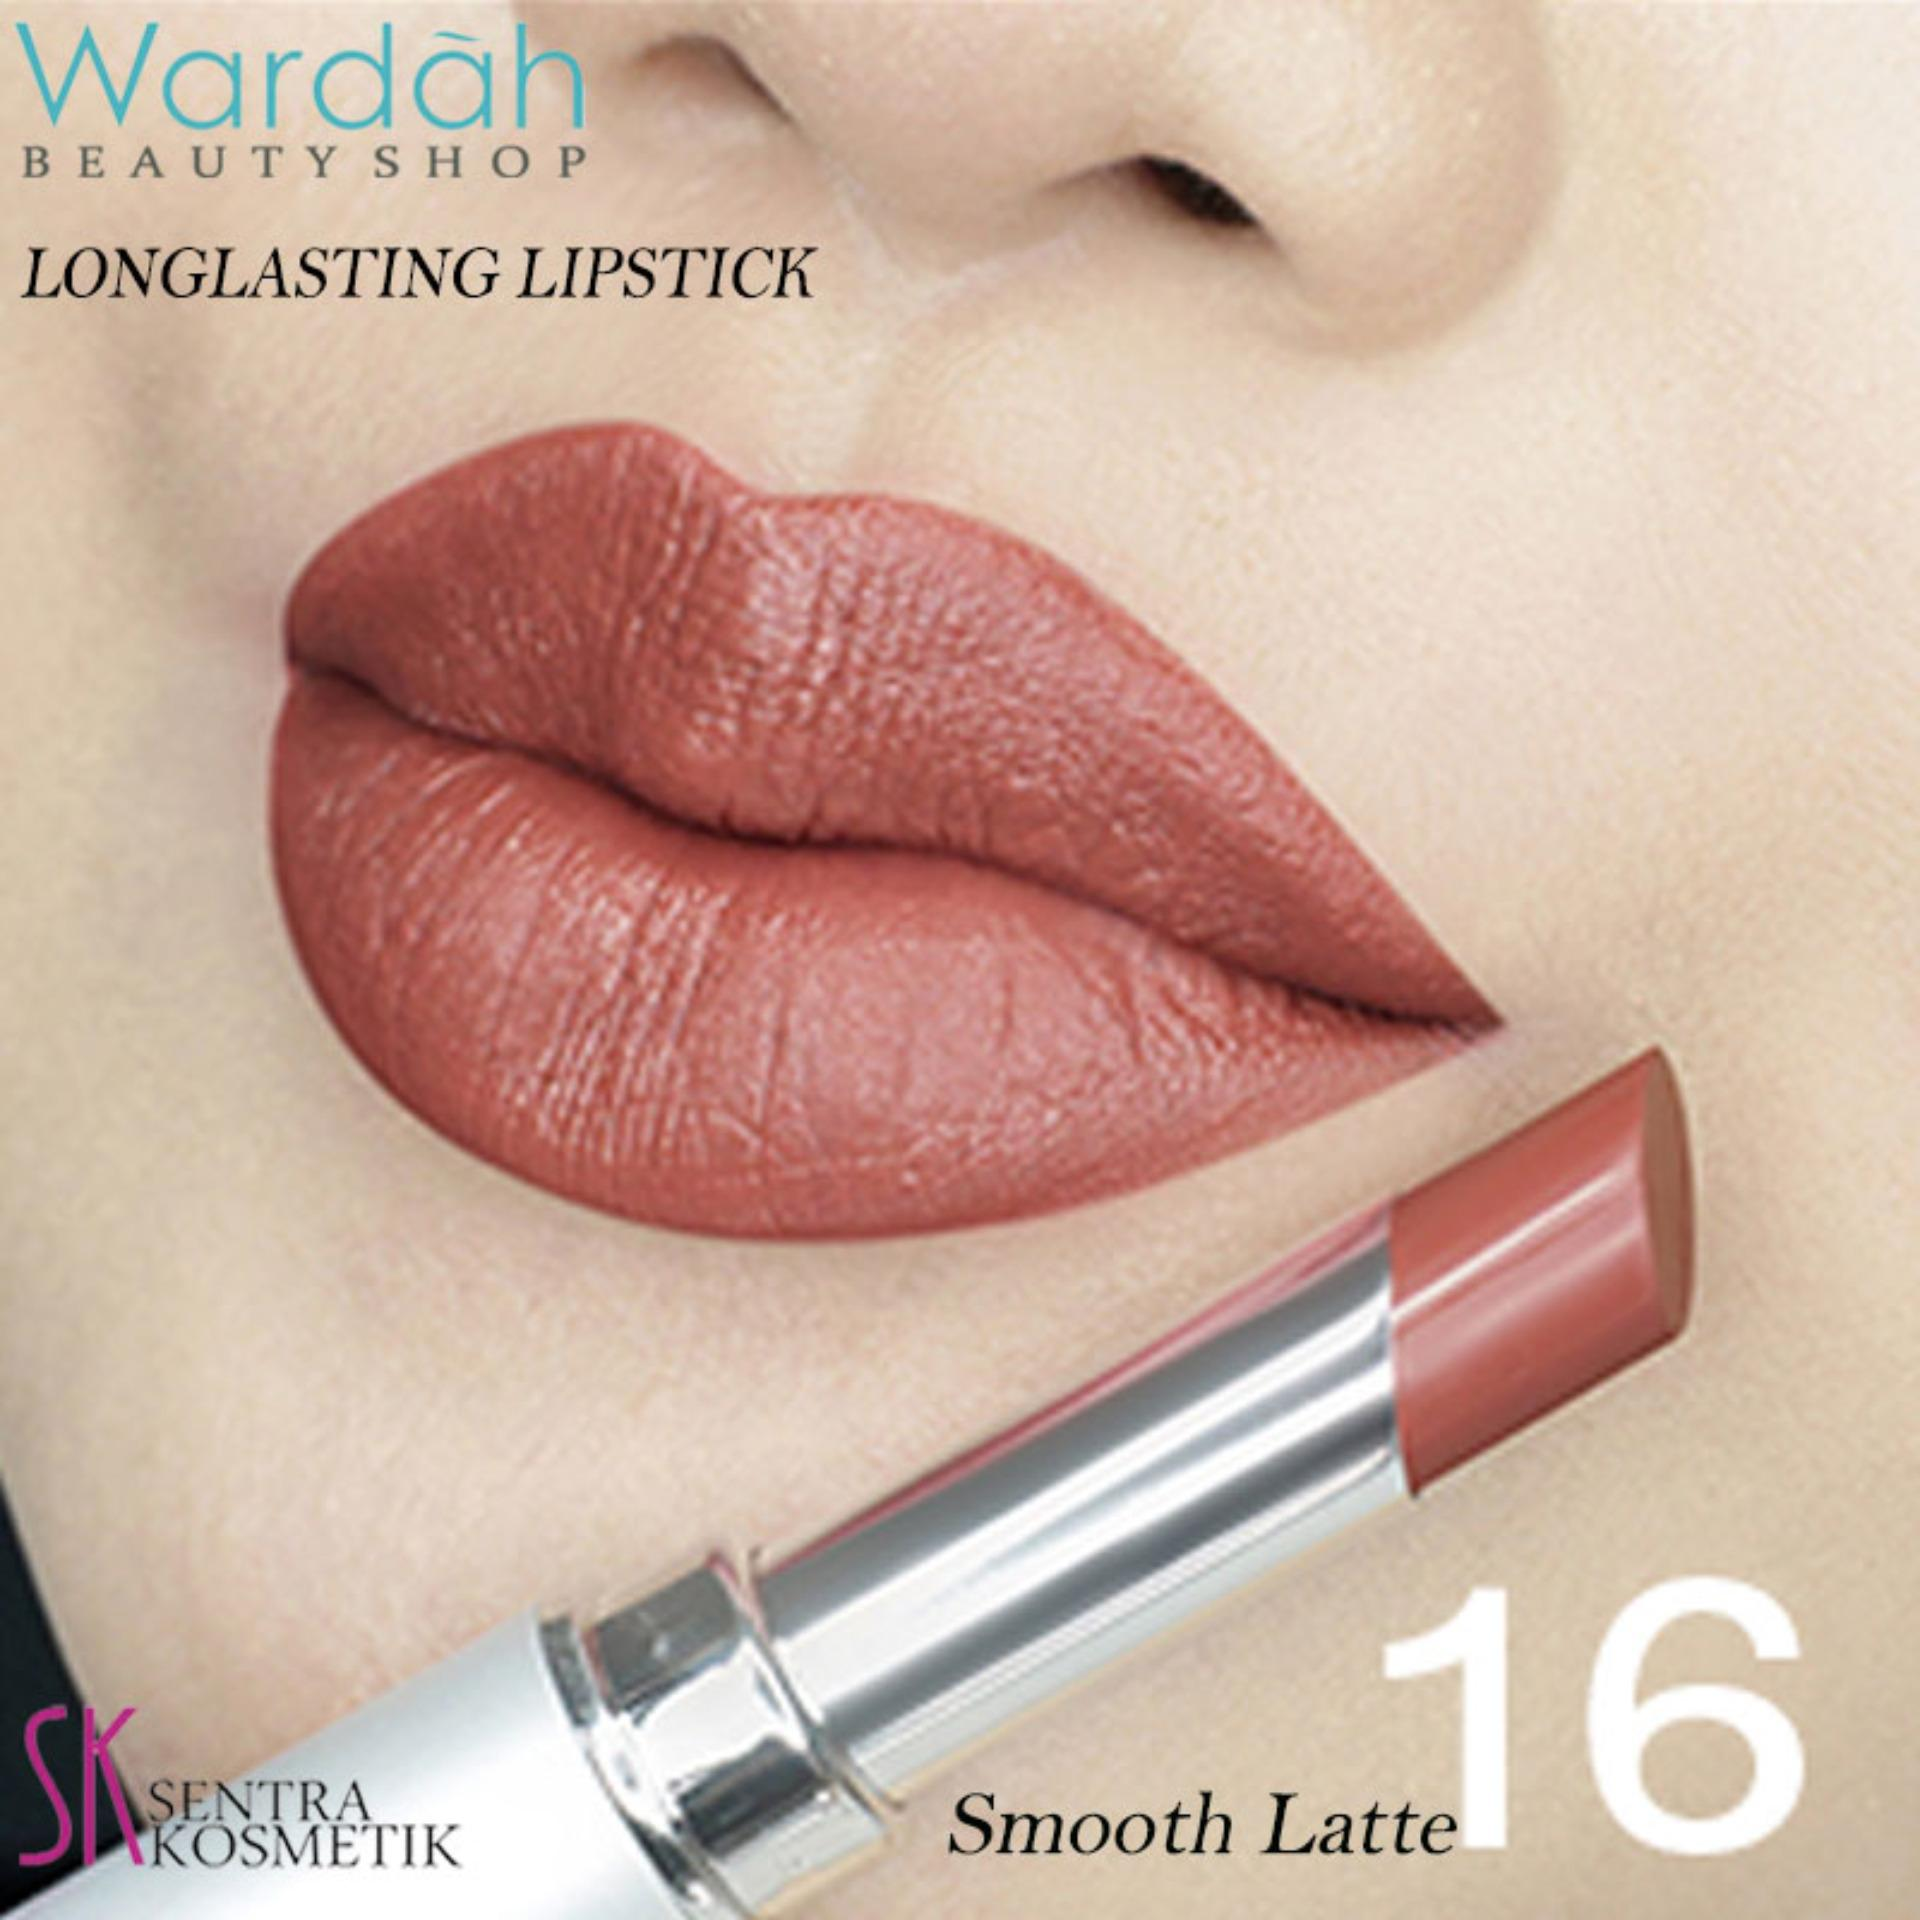 Hemat Wardah Matte Lipstik No 13 Cocoa Look Facial